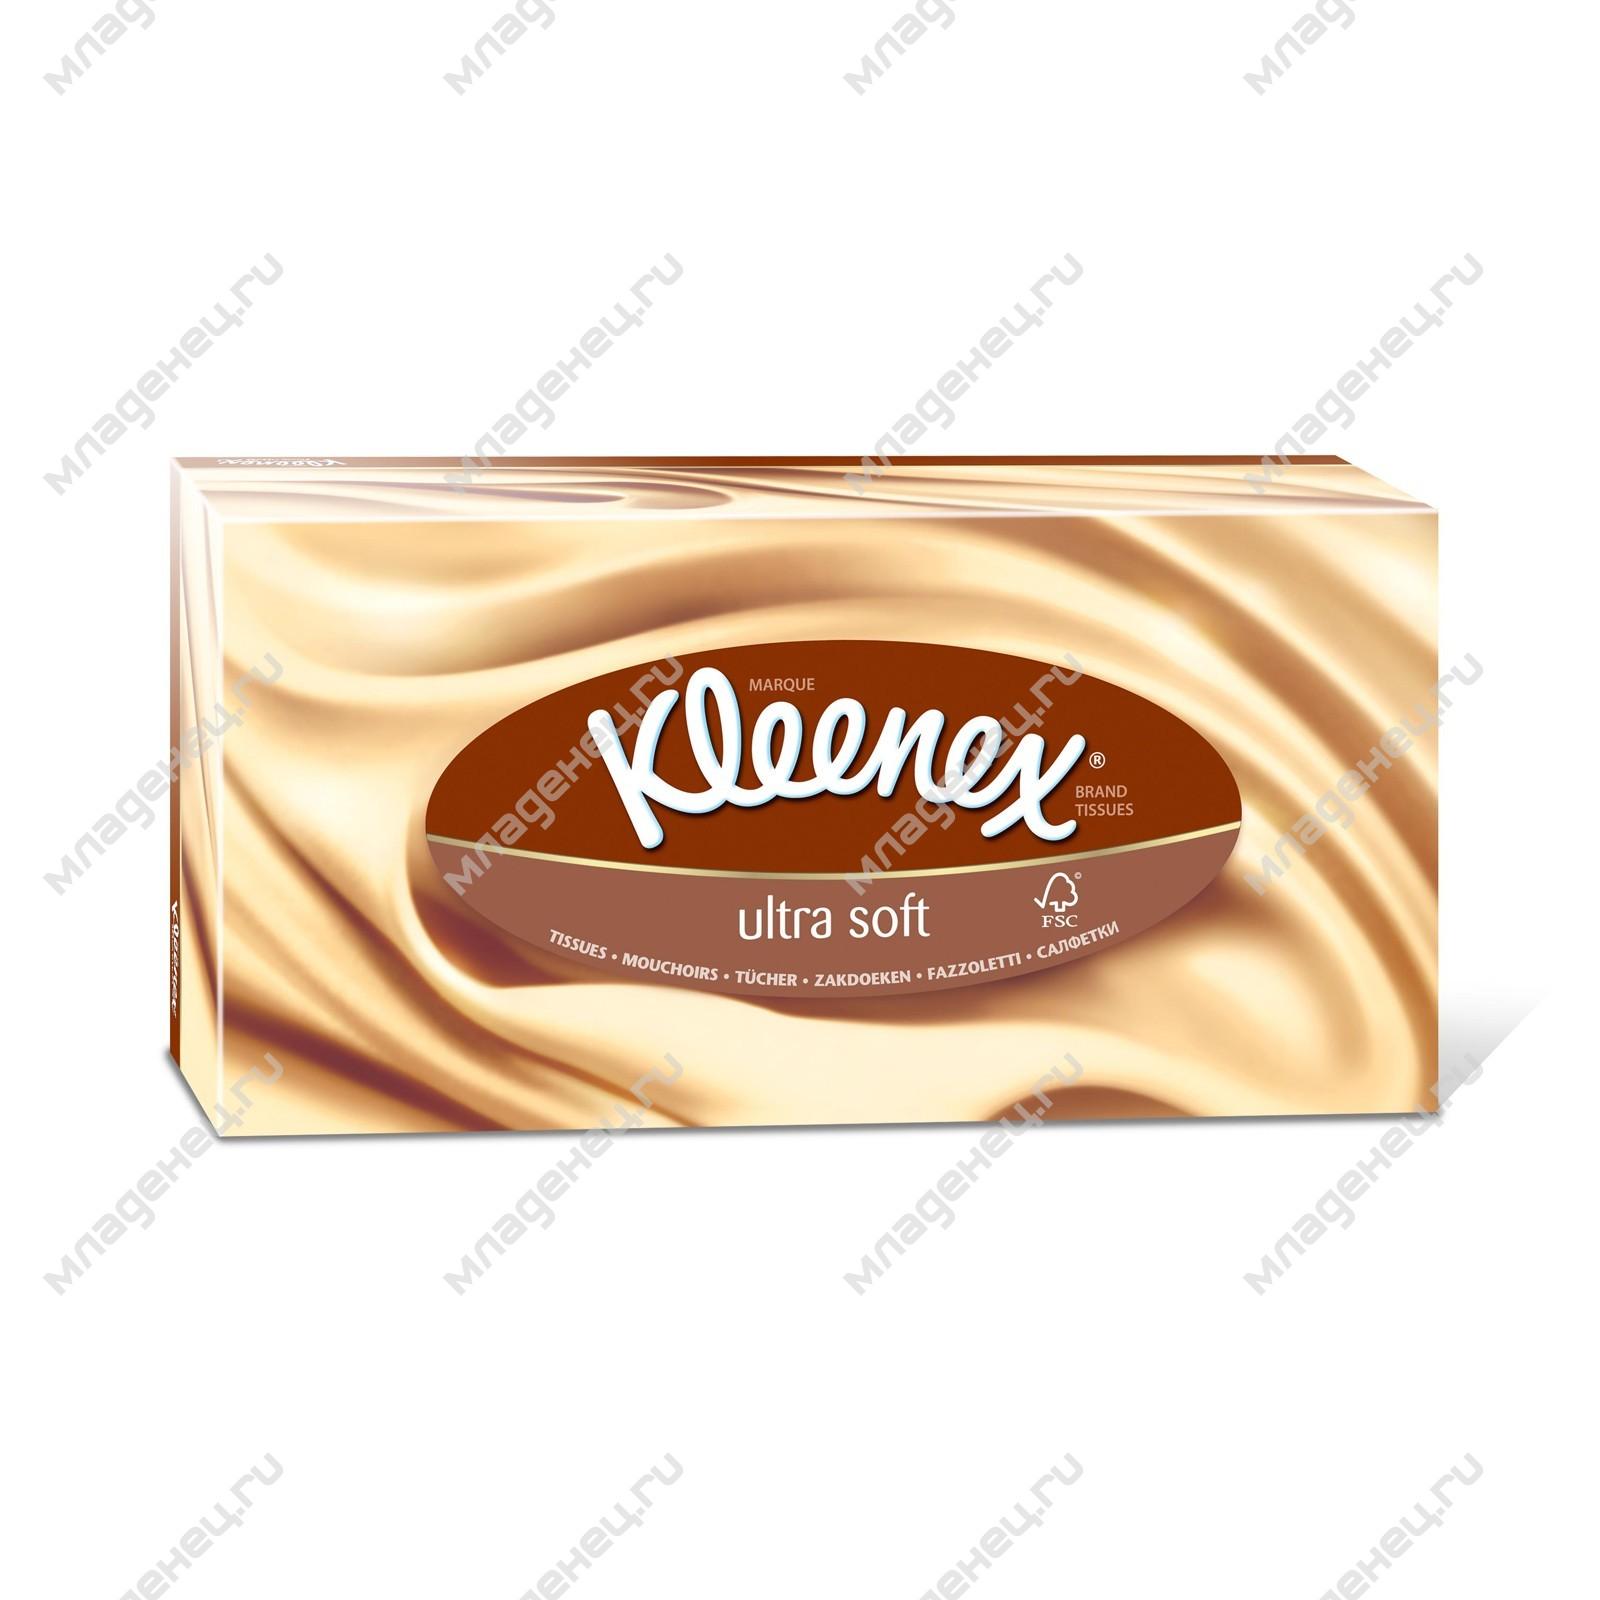 Бумажные салфетки Kleenex ULTRA SOFT 3-х слойные 56 шт<br>